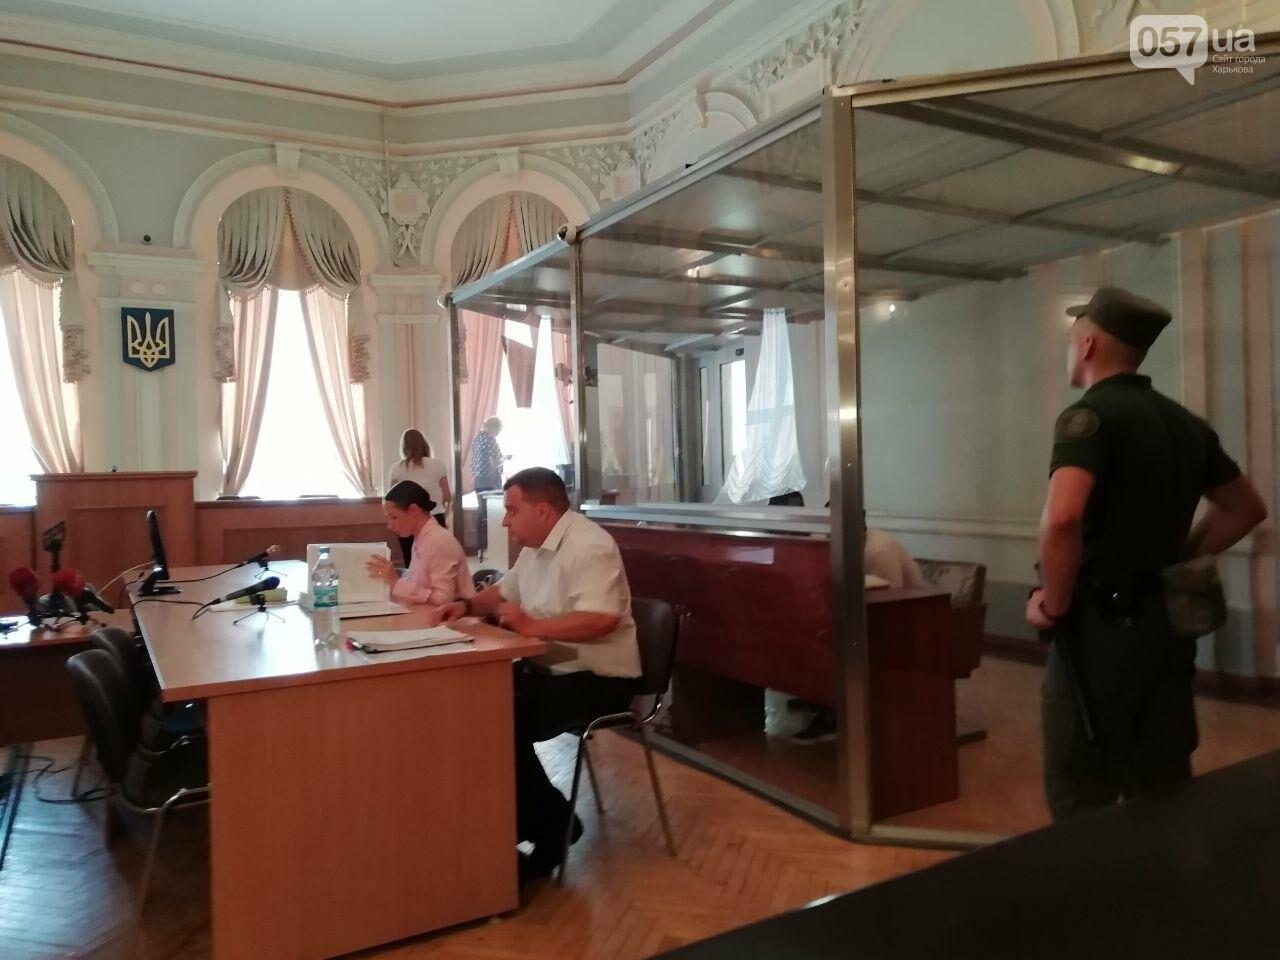 Апелляция по делу ДТП на Сумской: суд оставил приговор без изменений, - ОНЛАЙН-ТРАНСЛЯЦИЯ, фото-17